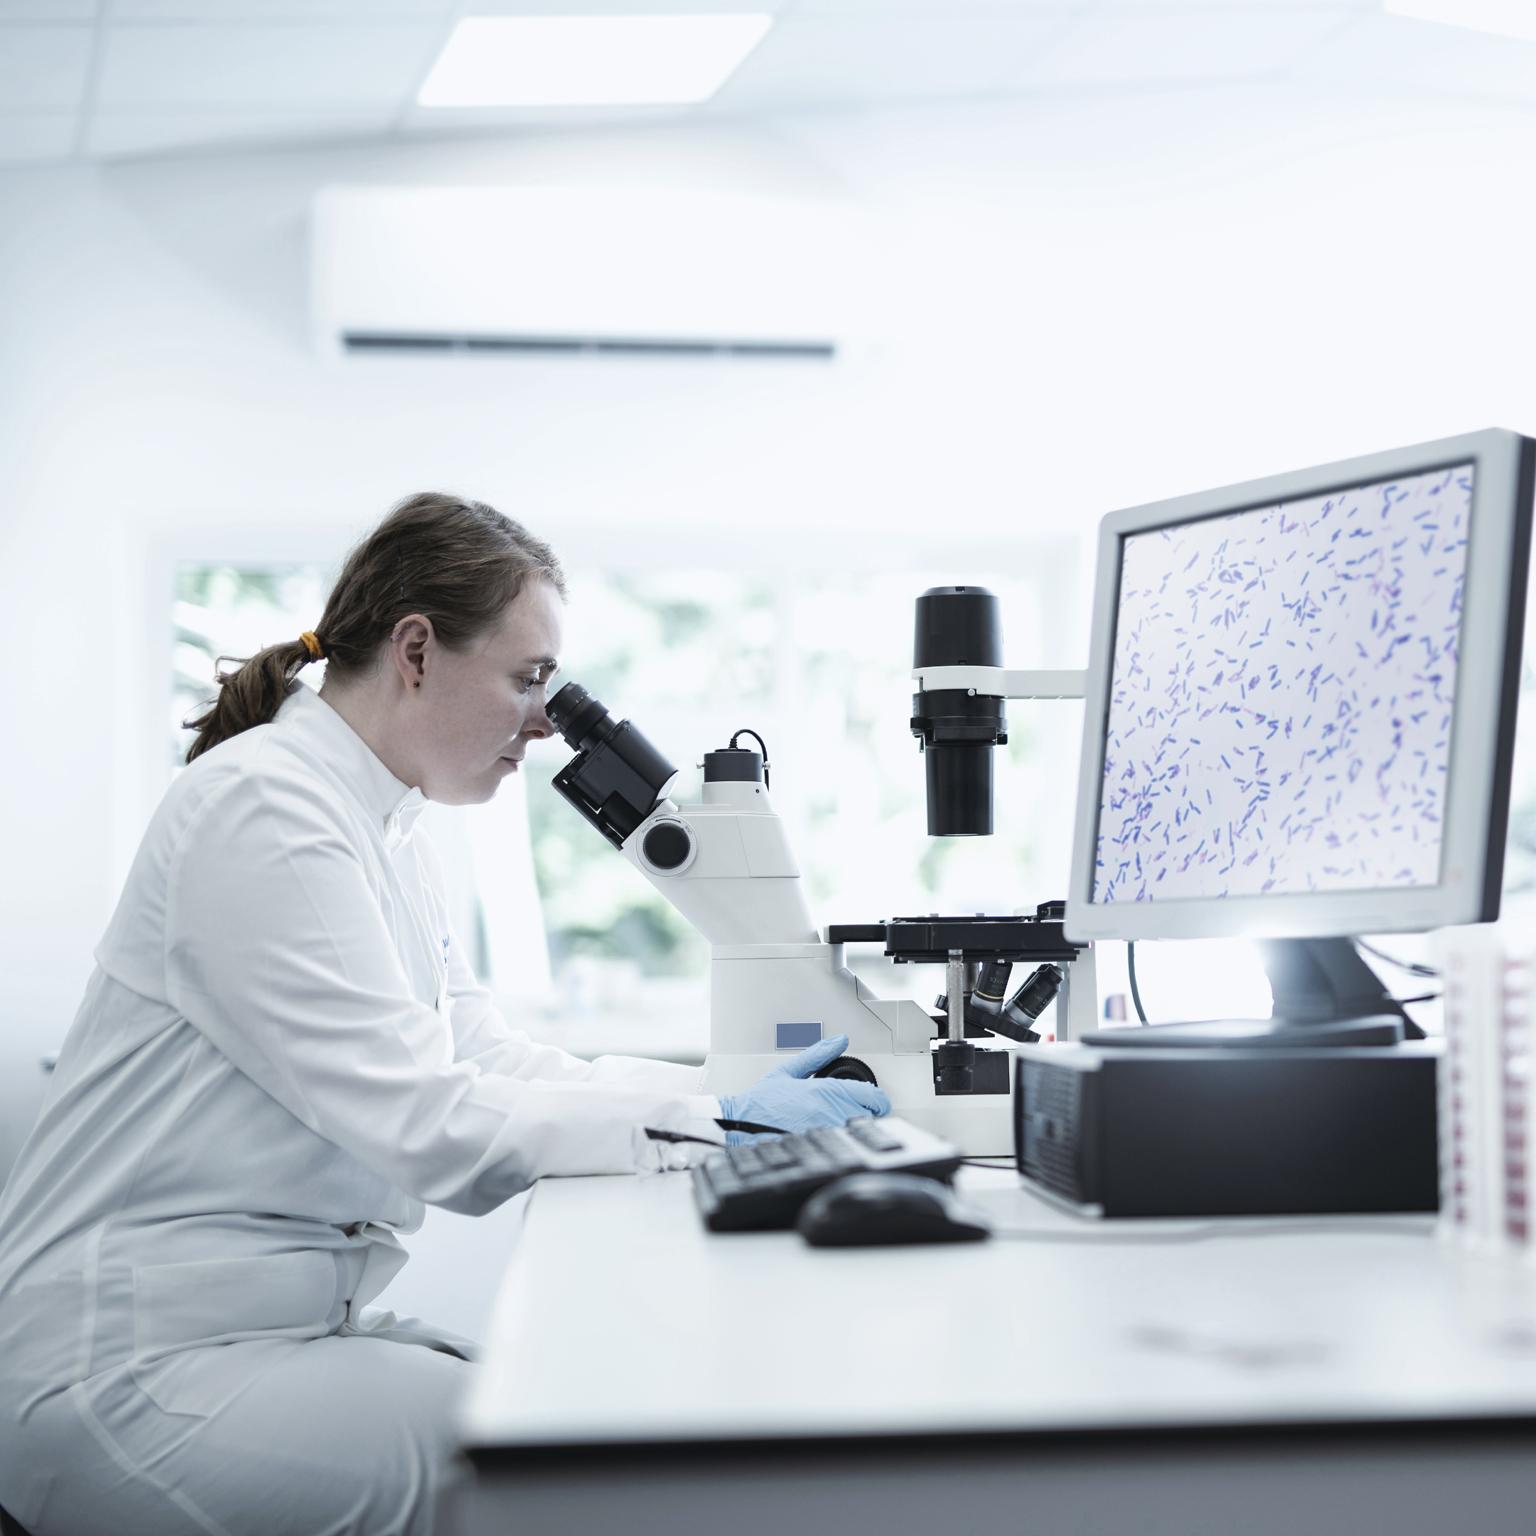 recalculating-the-future-of-drug-development-with-quantum-computing